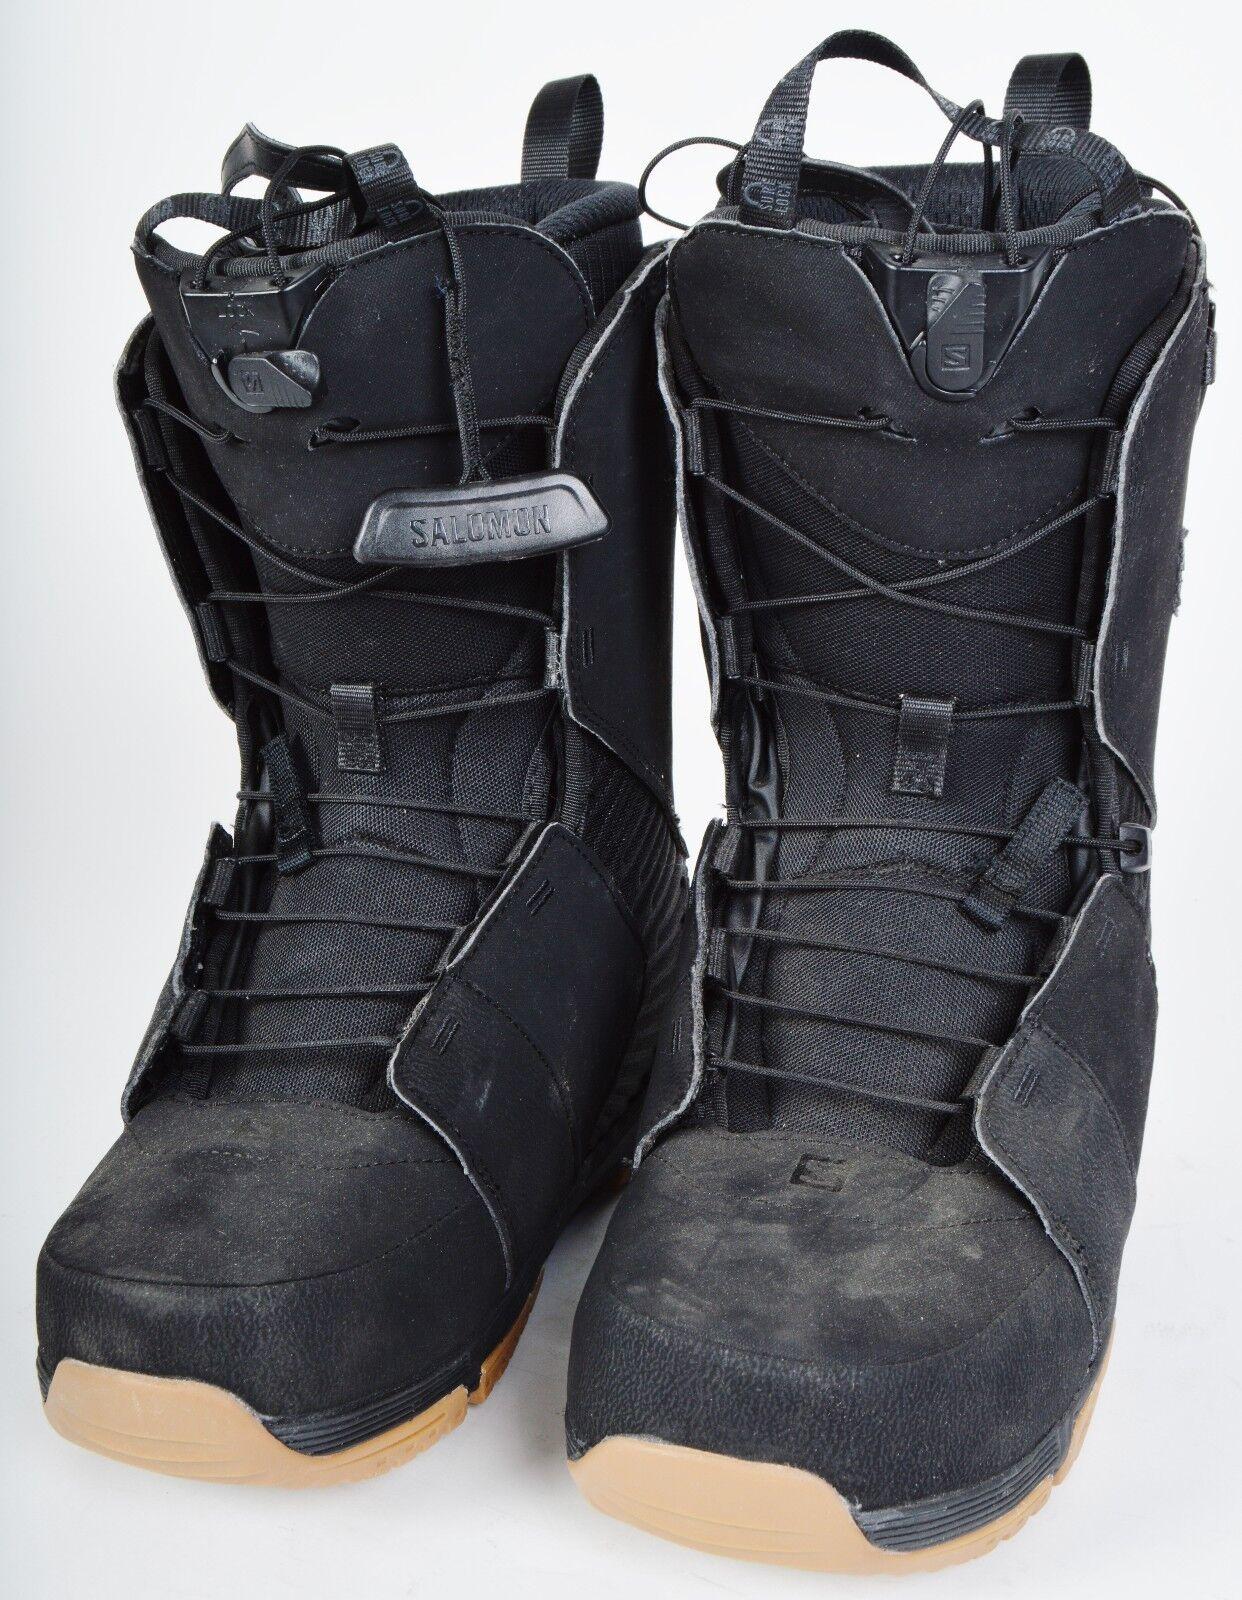 Details zu 2016 MENS SALOMON DIALOGUE SNOWBOARD BOOTS $260 8.5 Demo black zonelock lacing